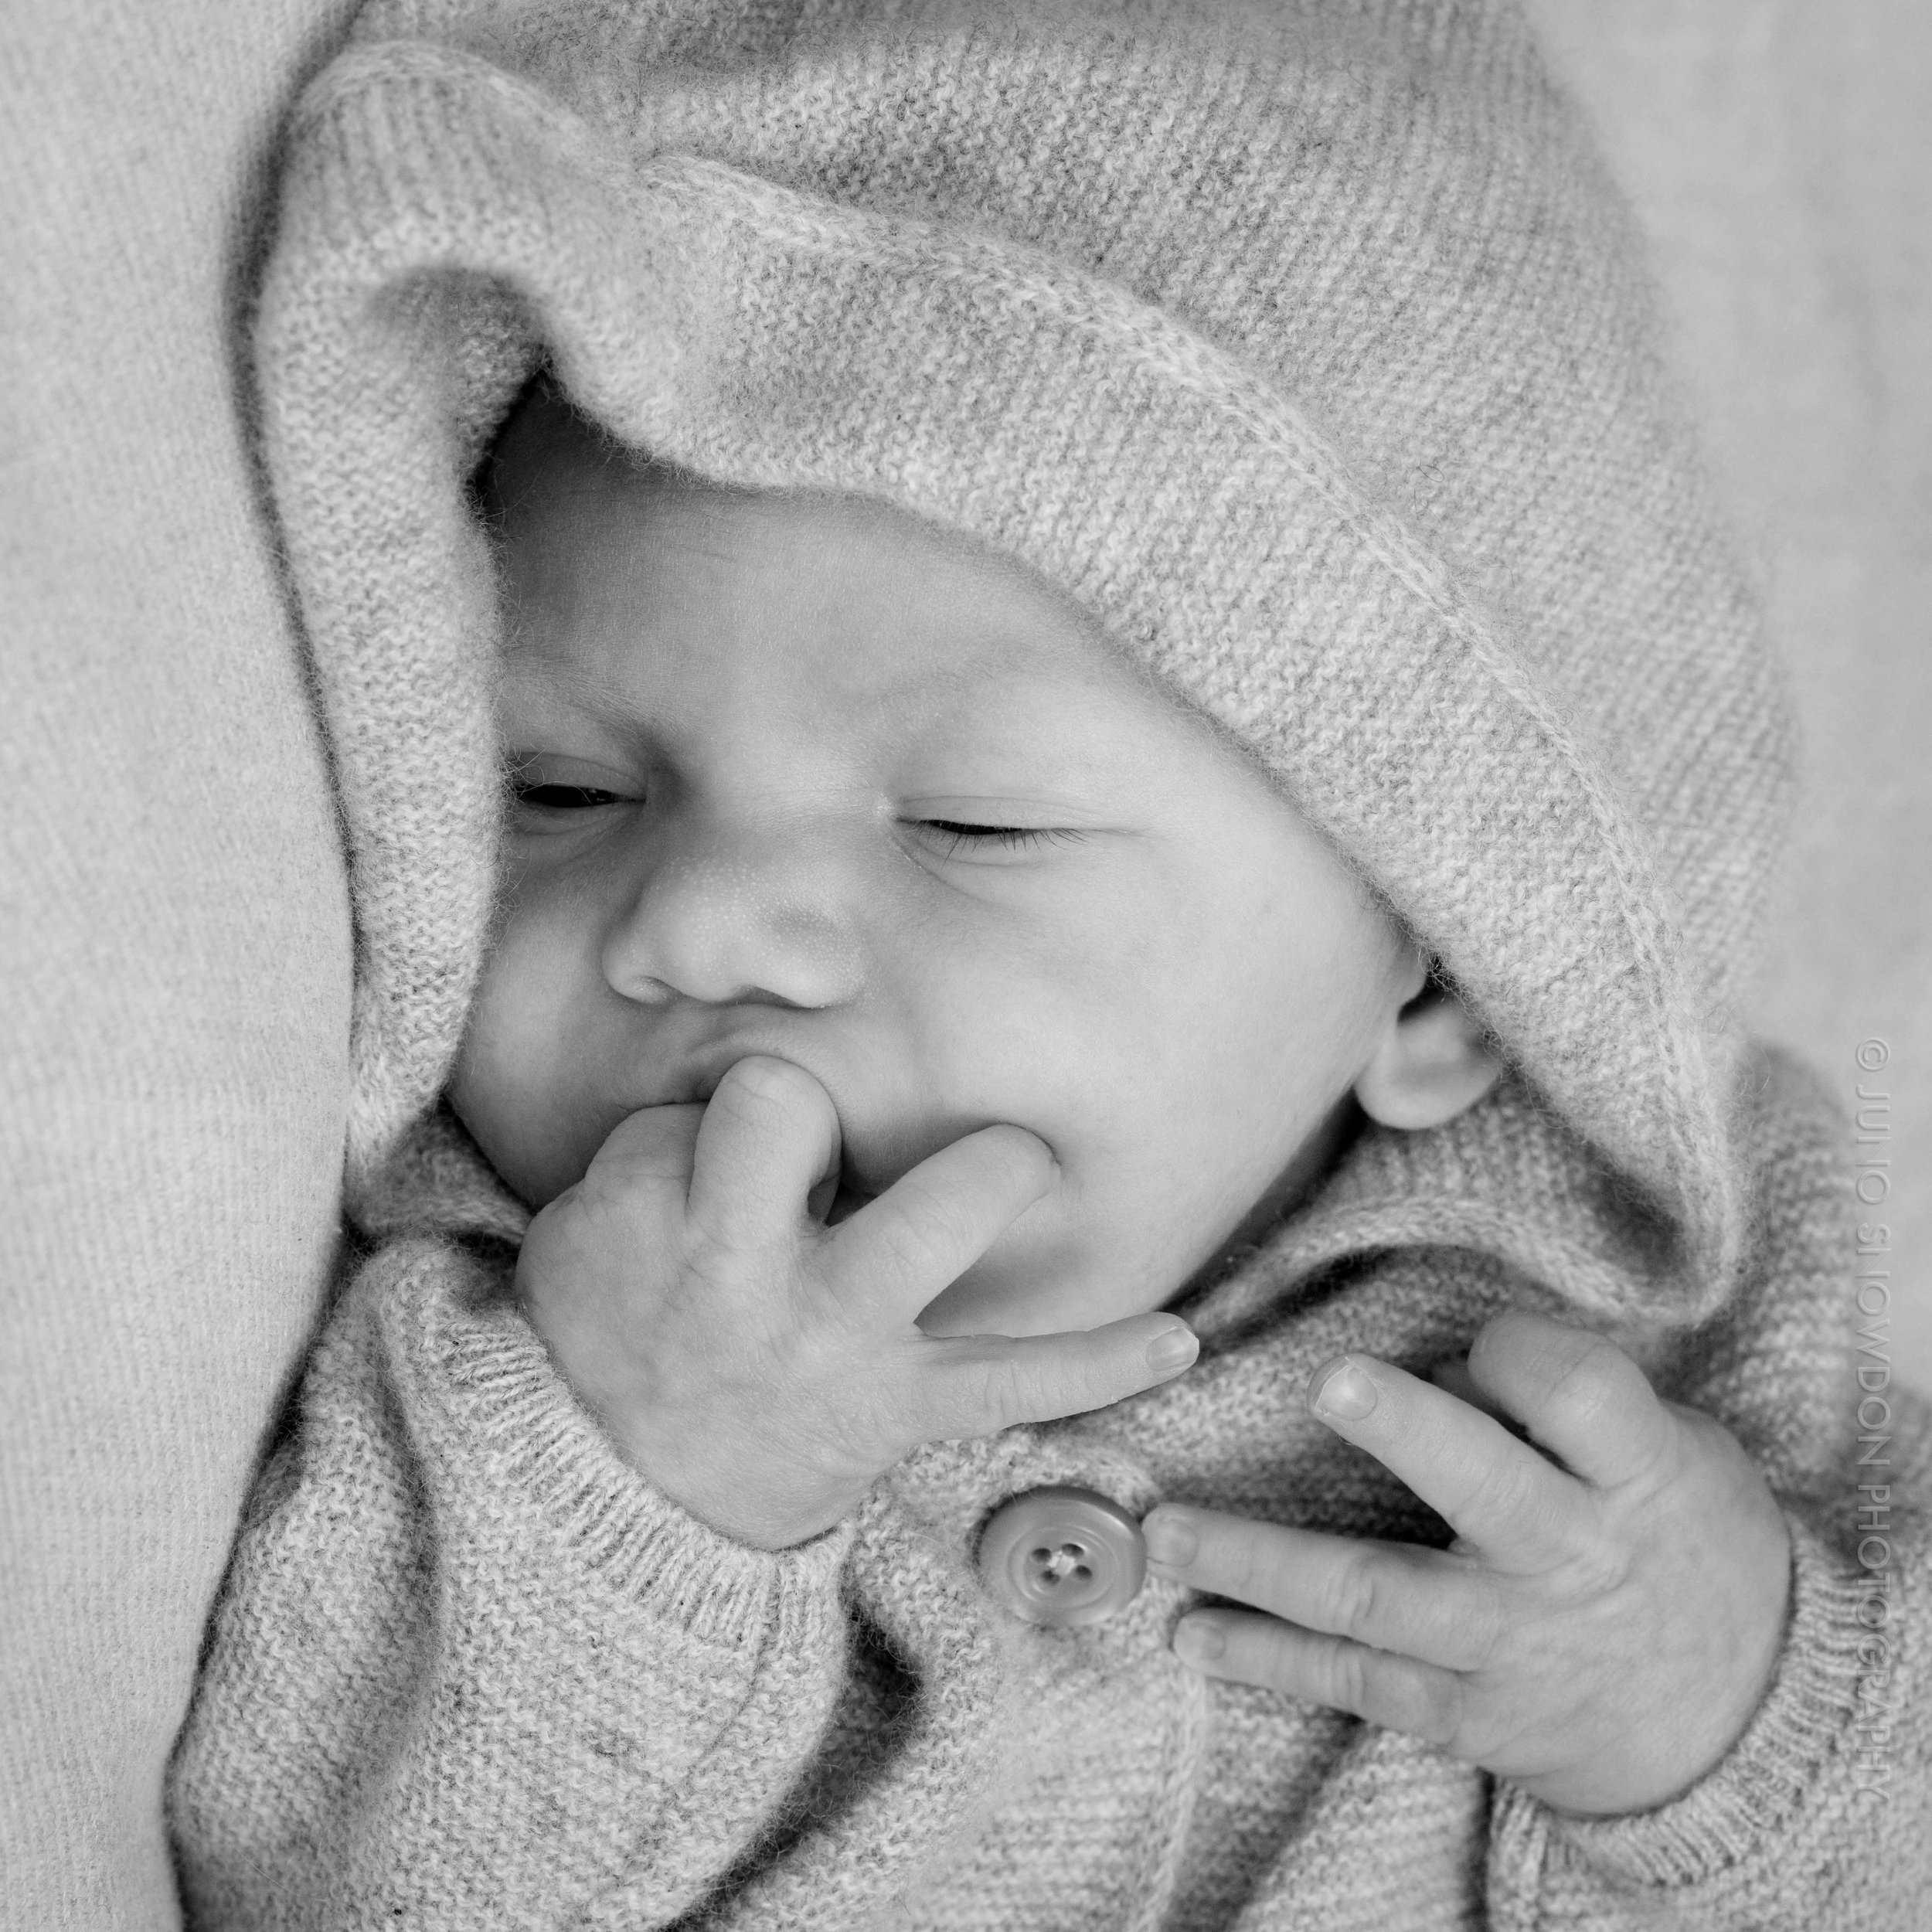 juno-snowdon-photography-newborn-portrait-7021.jpg